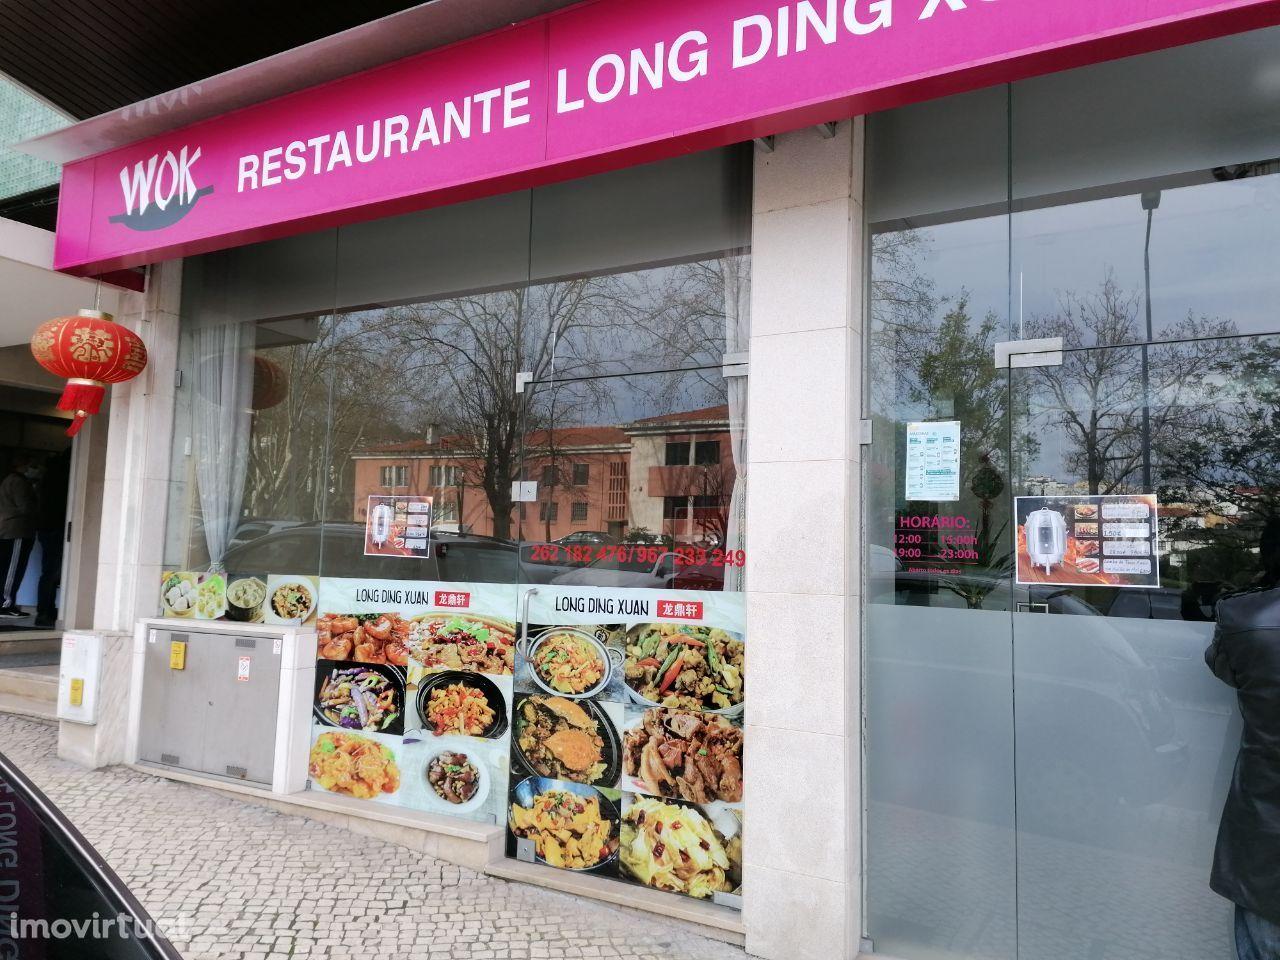 Restaurante centro de Alcobaça todo equipado a funcionar bom negocio